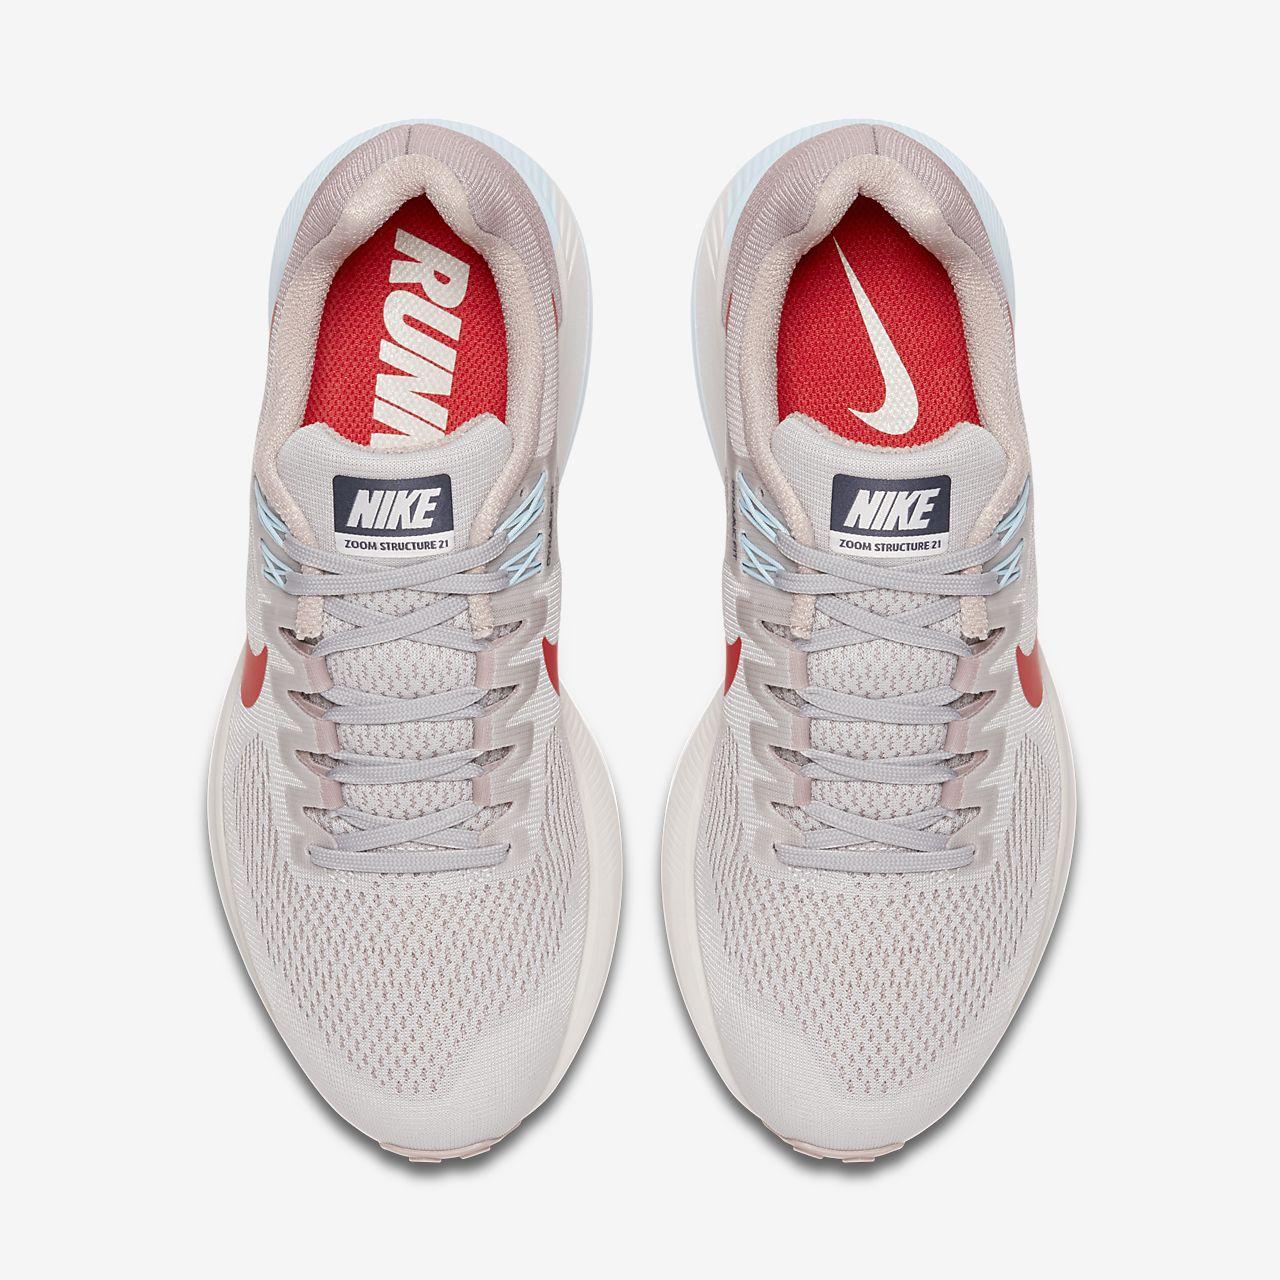 Nike Air Zoom Structure 21 Damen-Laufschuh